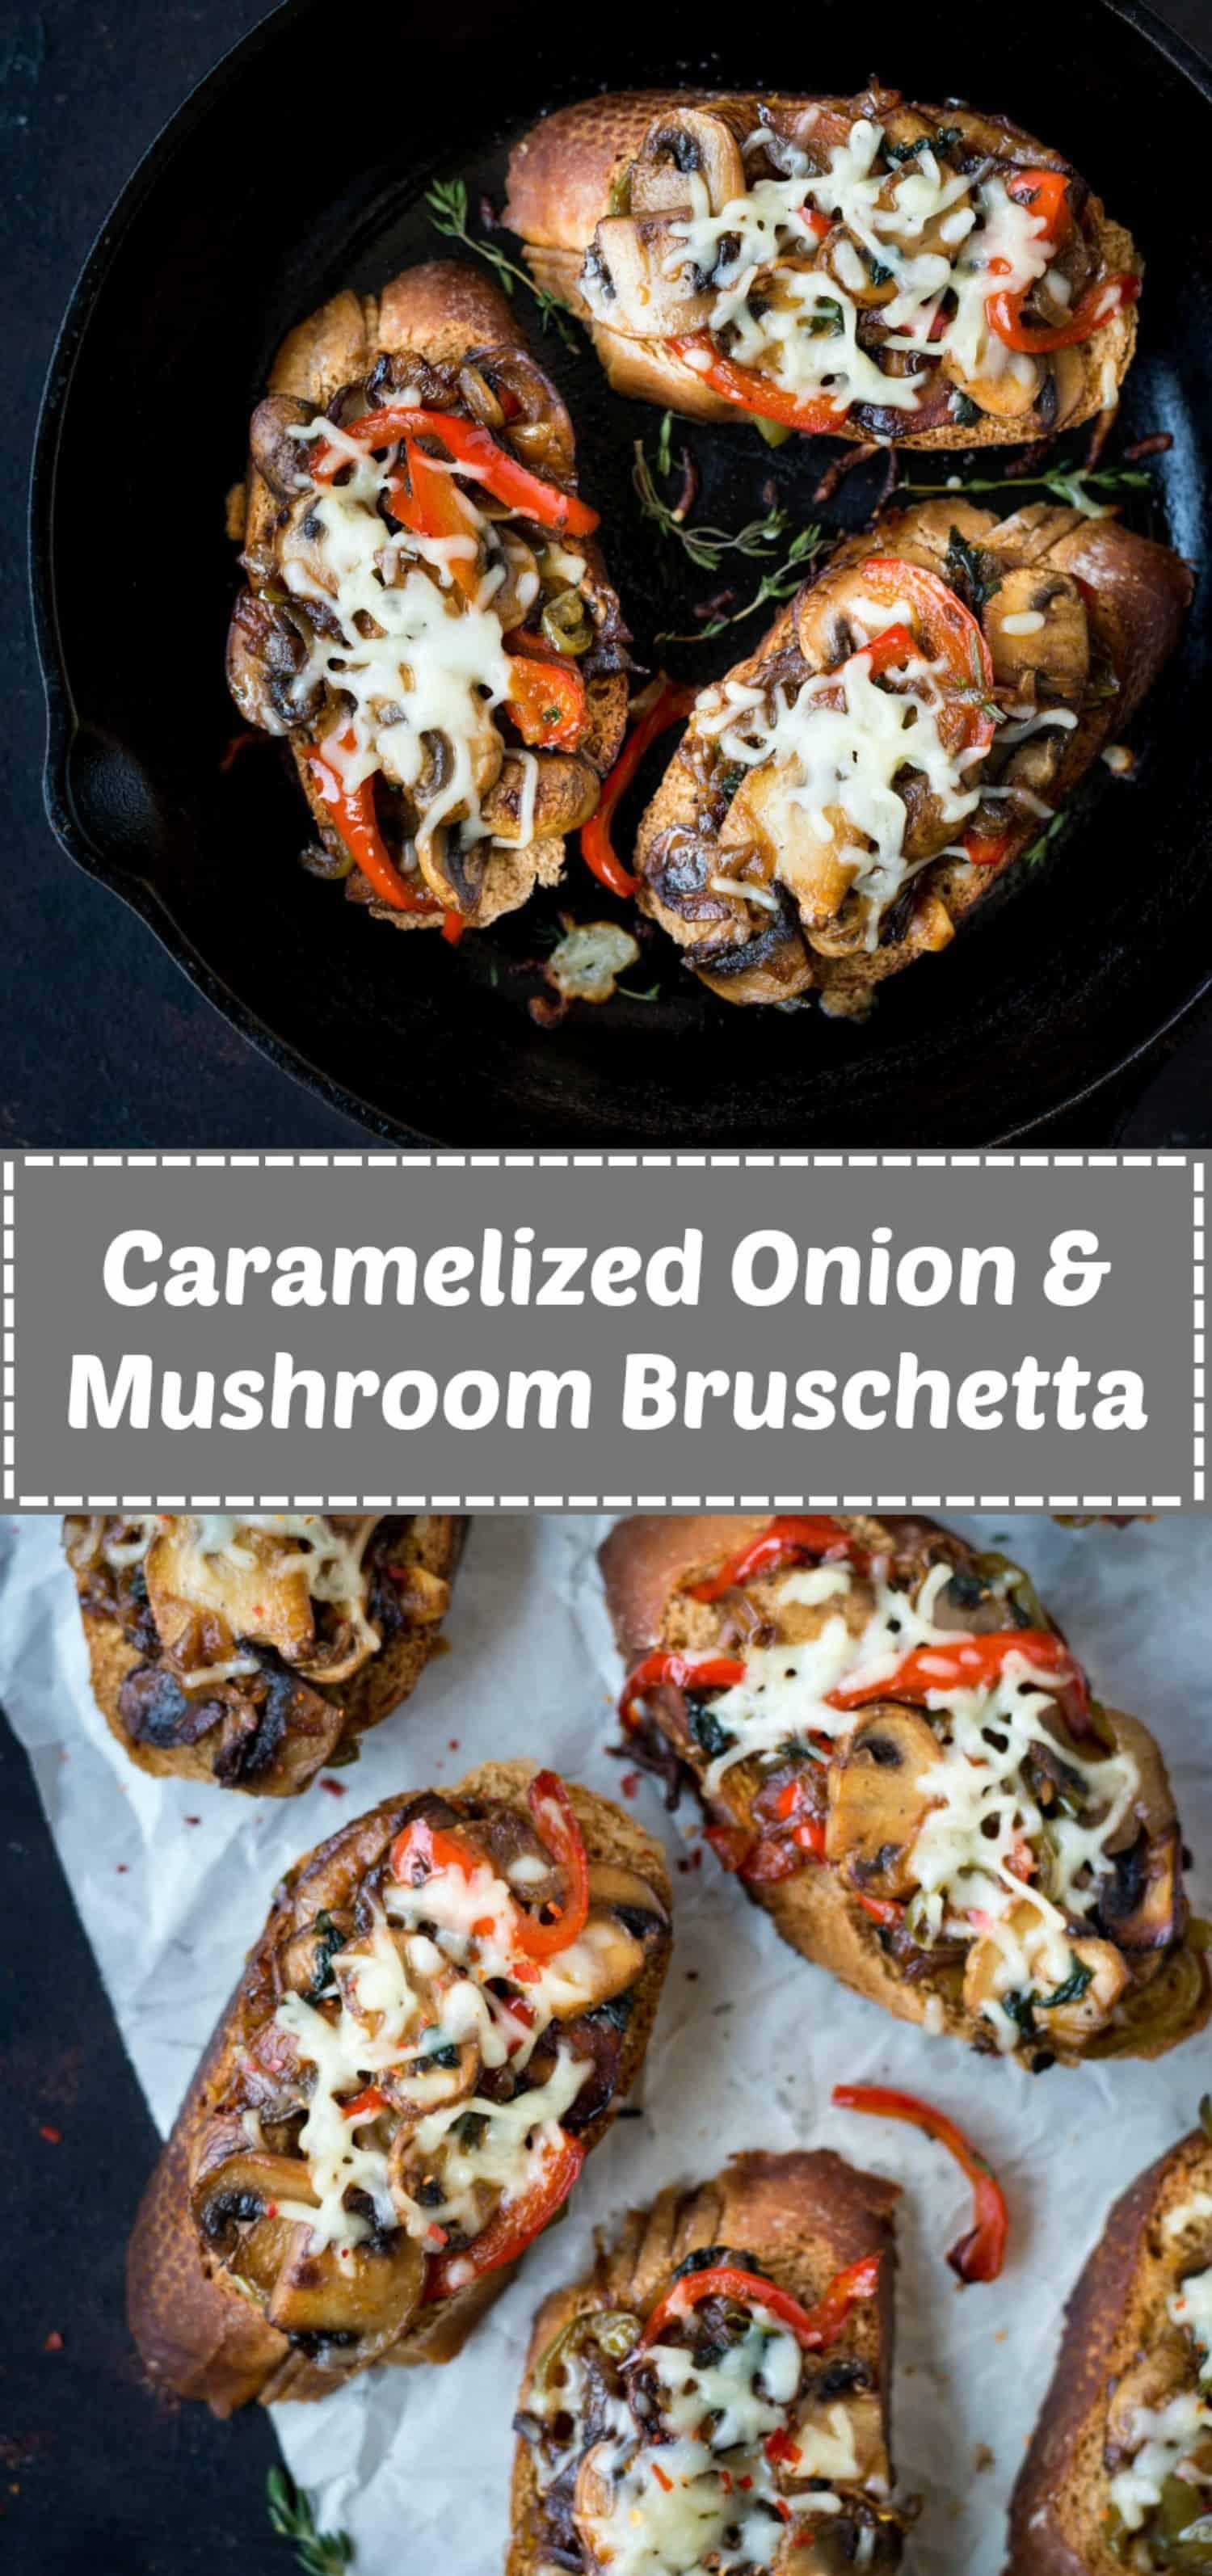 caramelized onion mushroom bruschetta